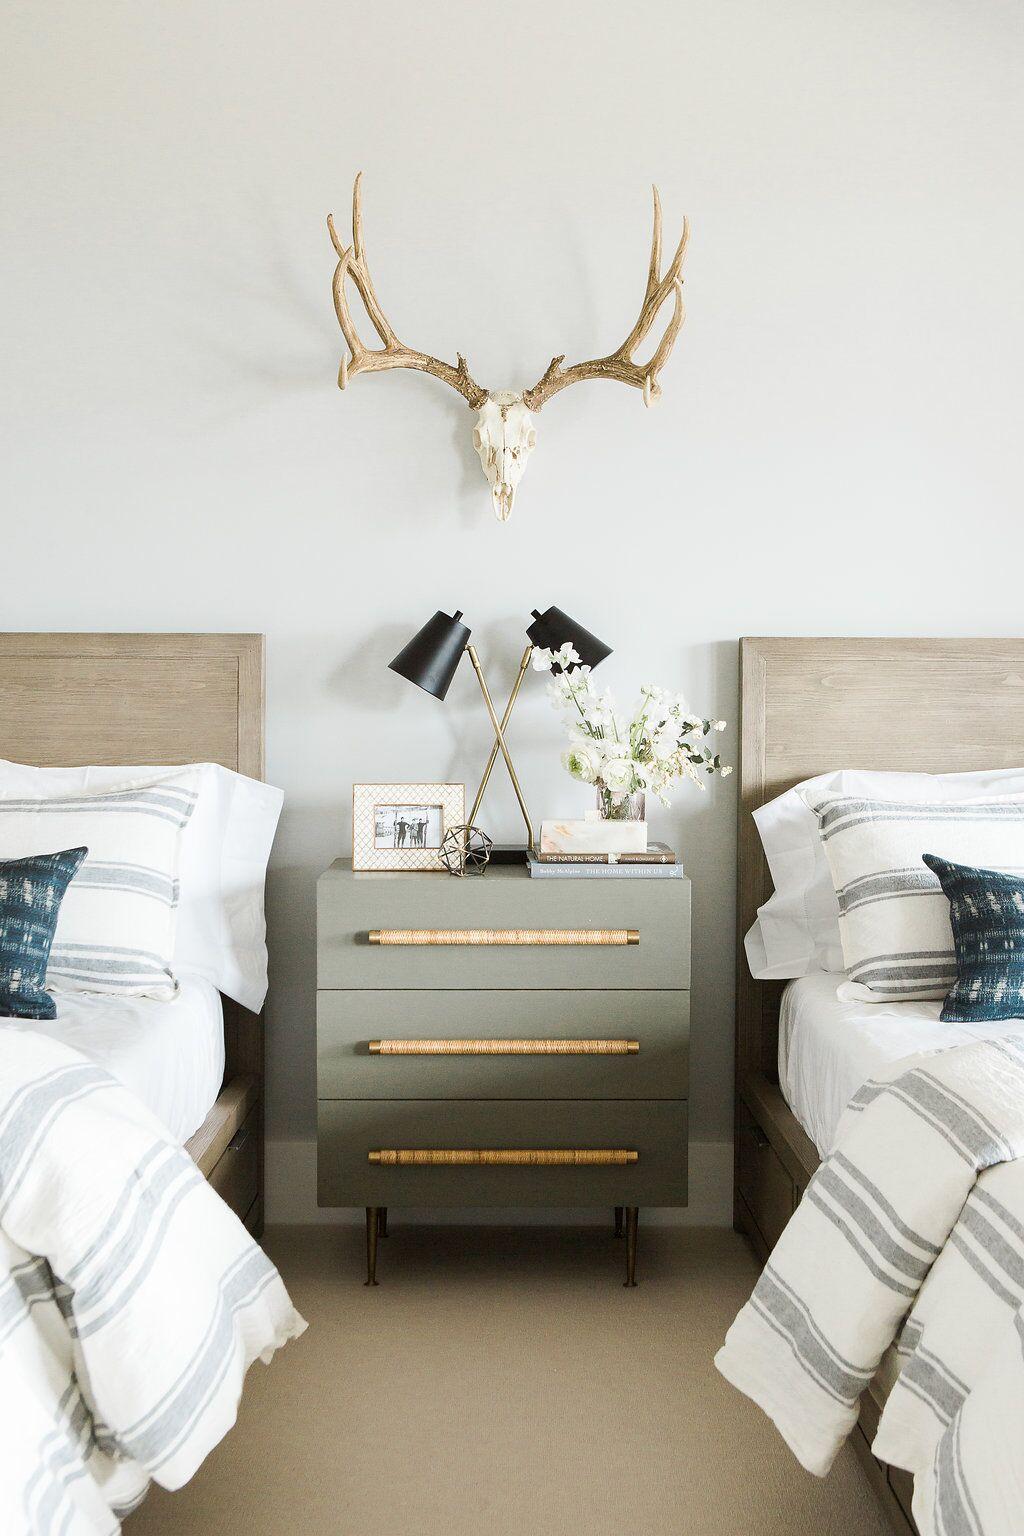 olive green modern nightstand between twin beds